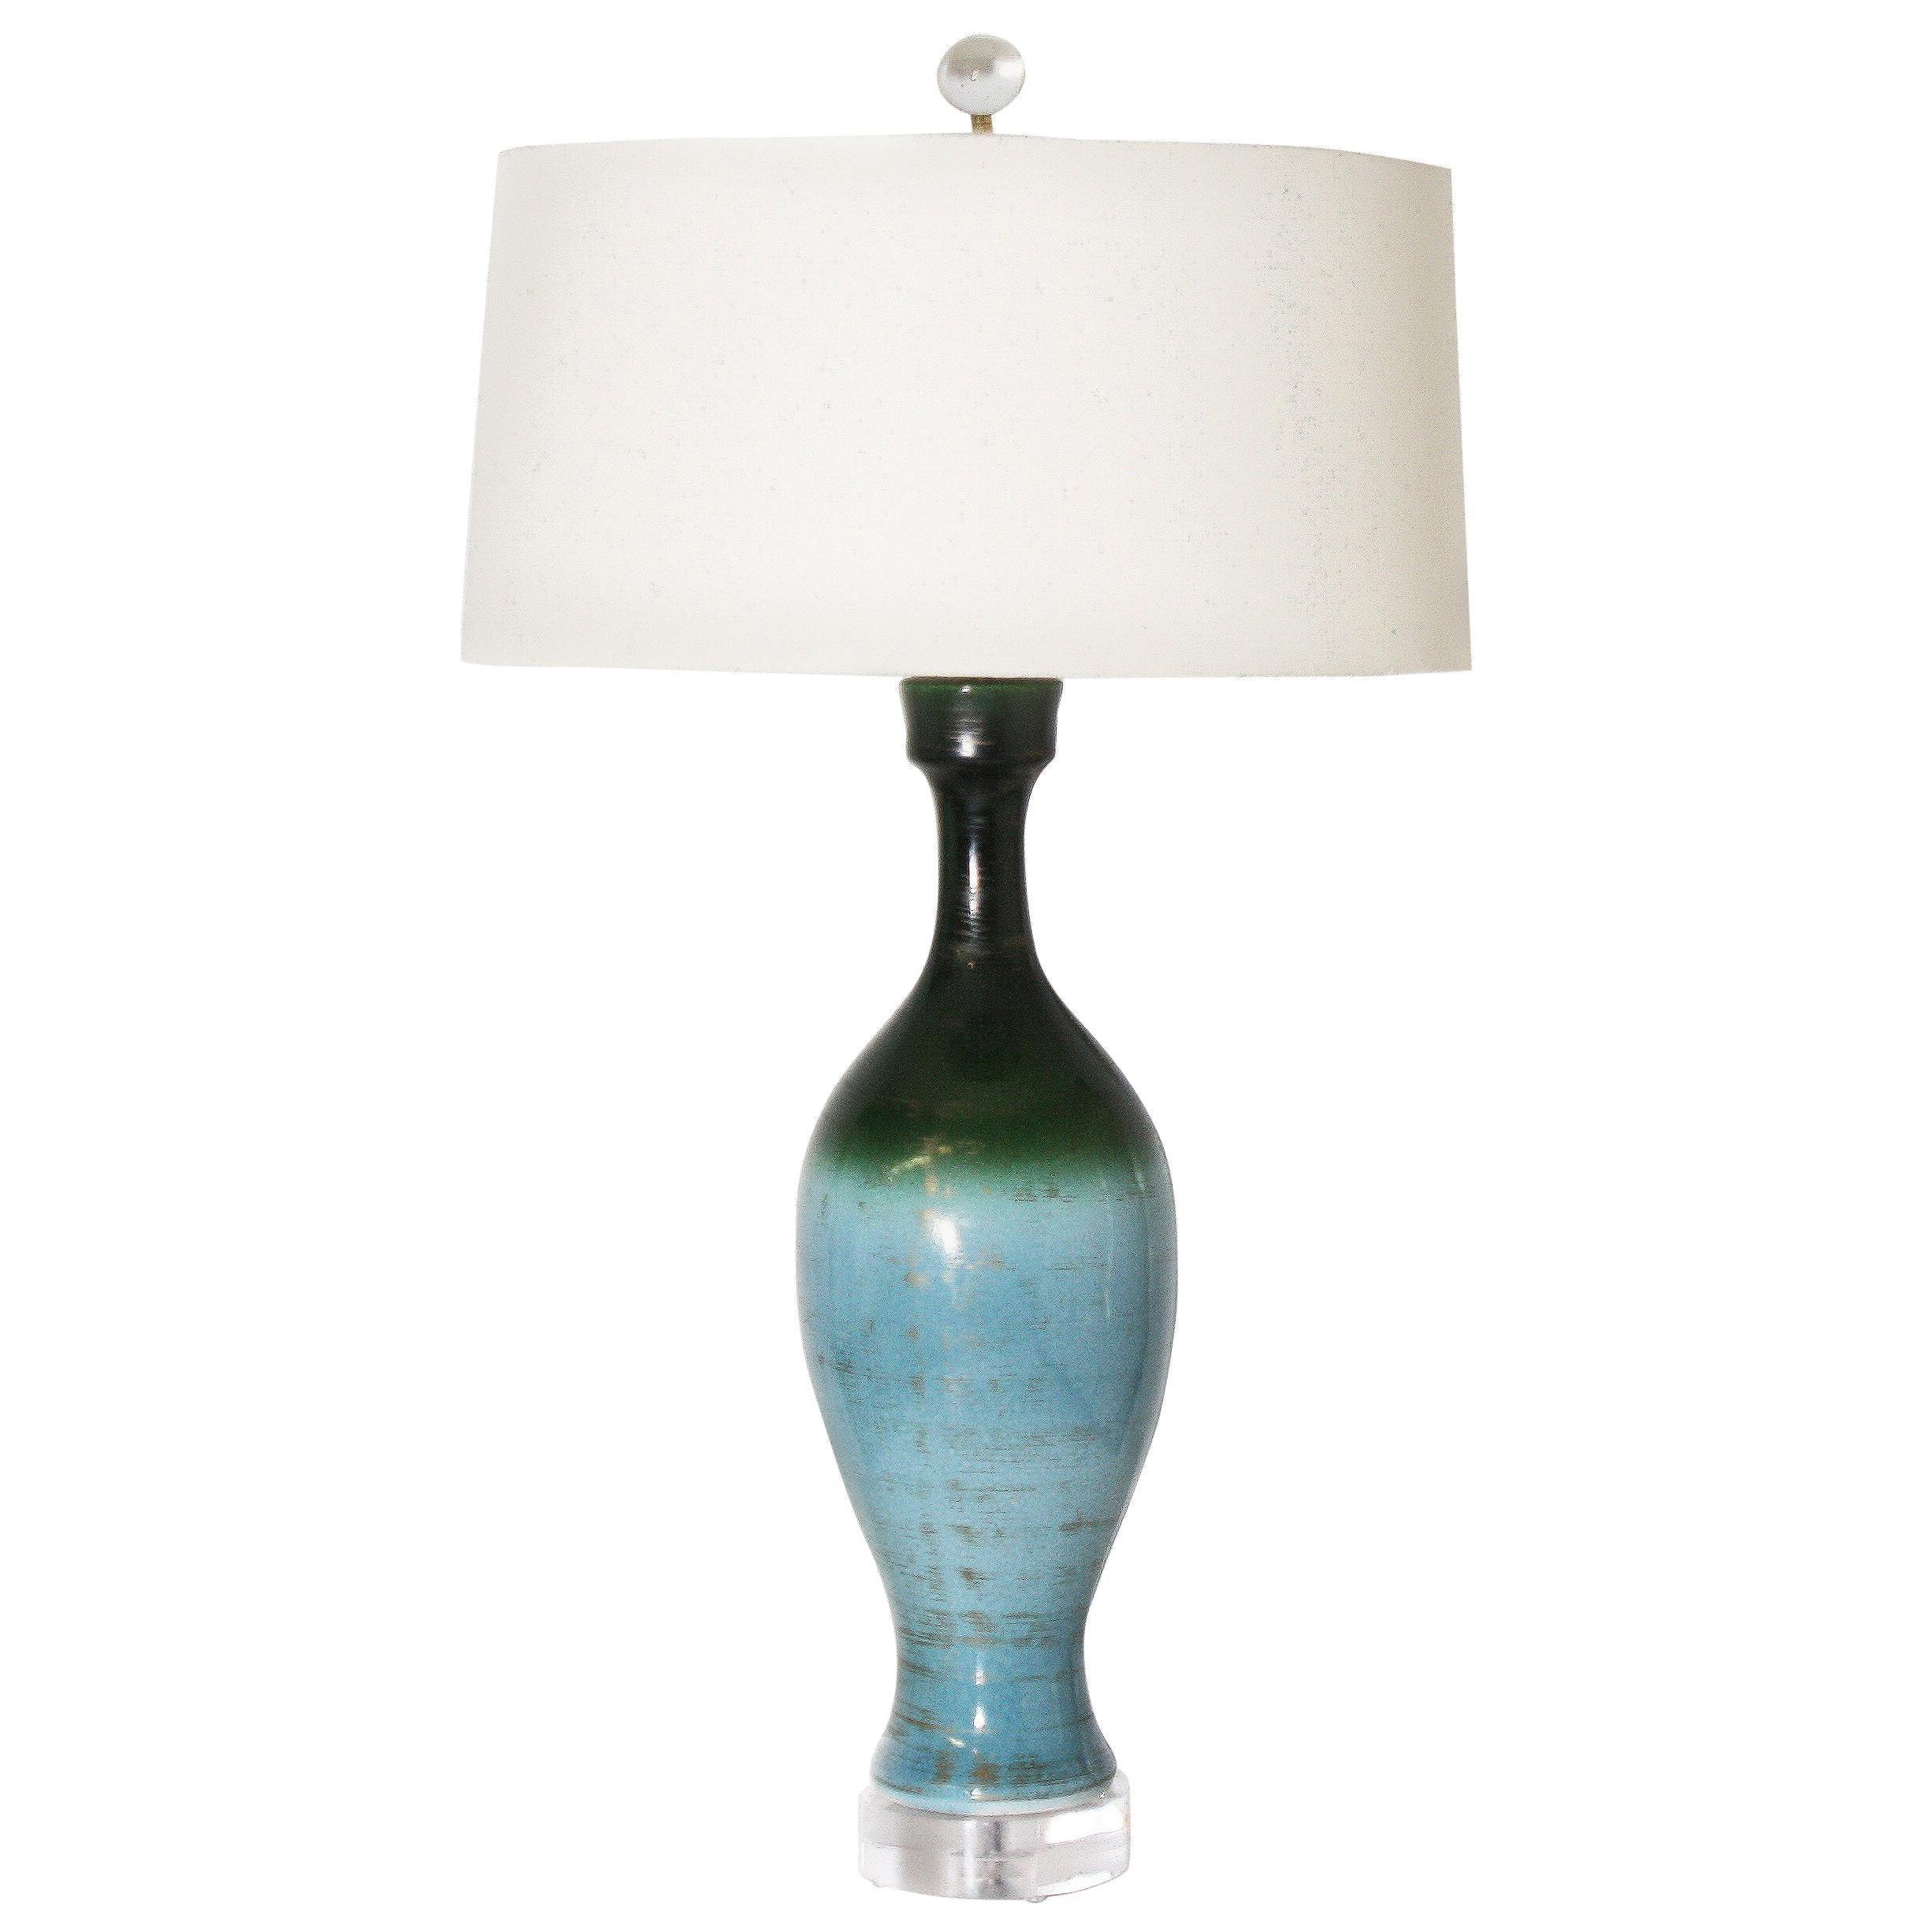 Ombre Glaze Urn Lamp, Circa 1960